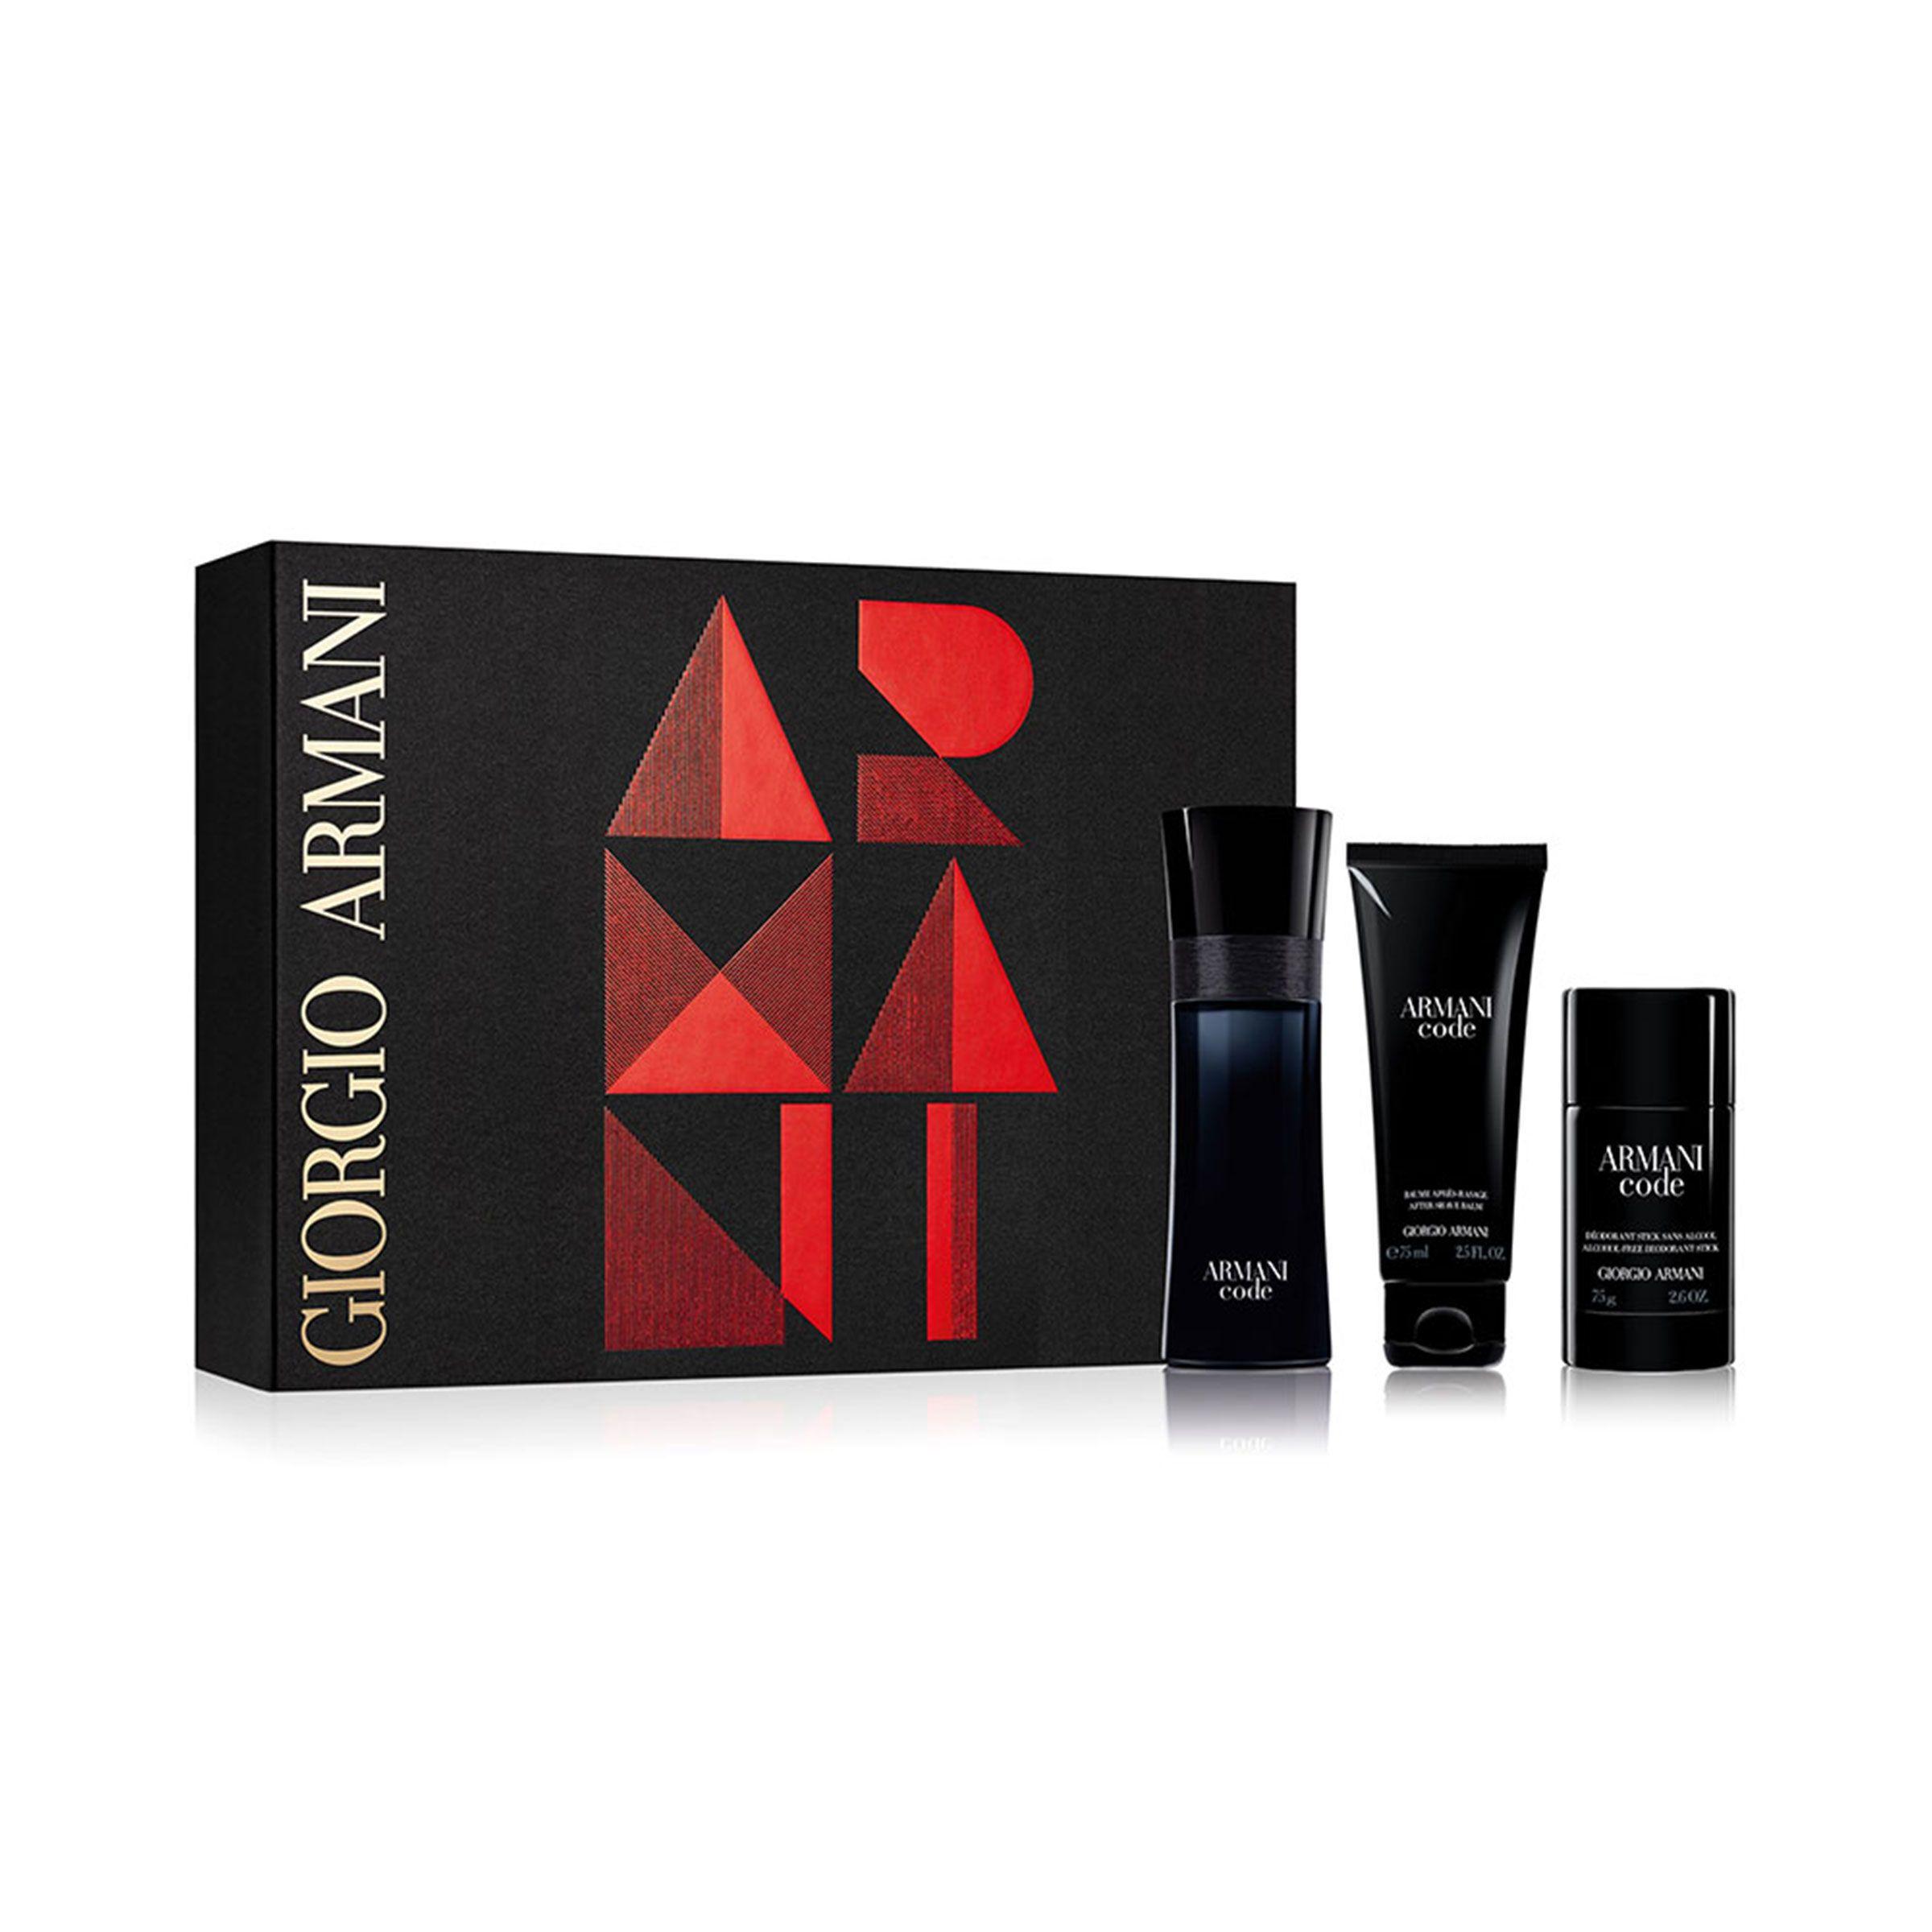 sc 1 st  Giorgio Armani Beauty & Armani Code Men Gift Set | Giorgio Armani Beauty